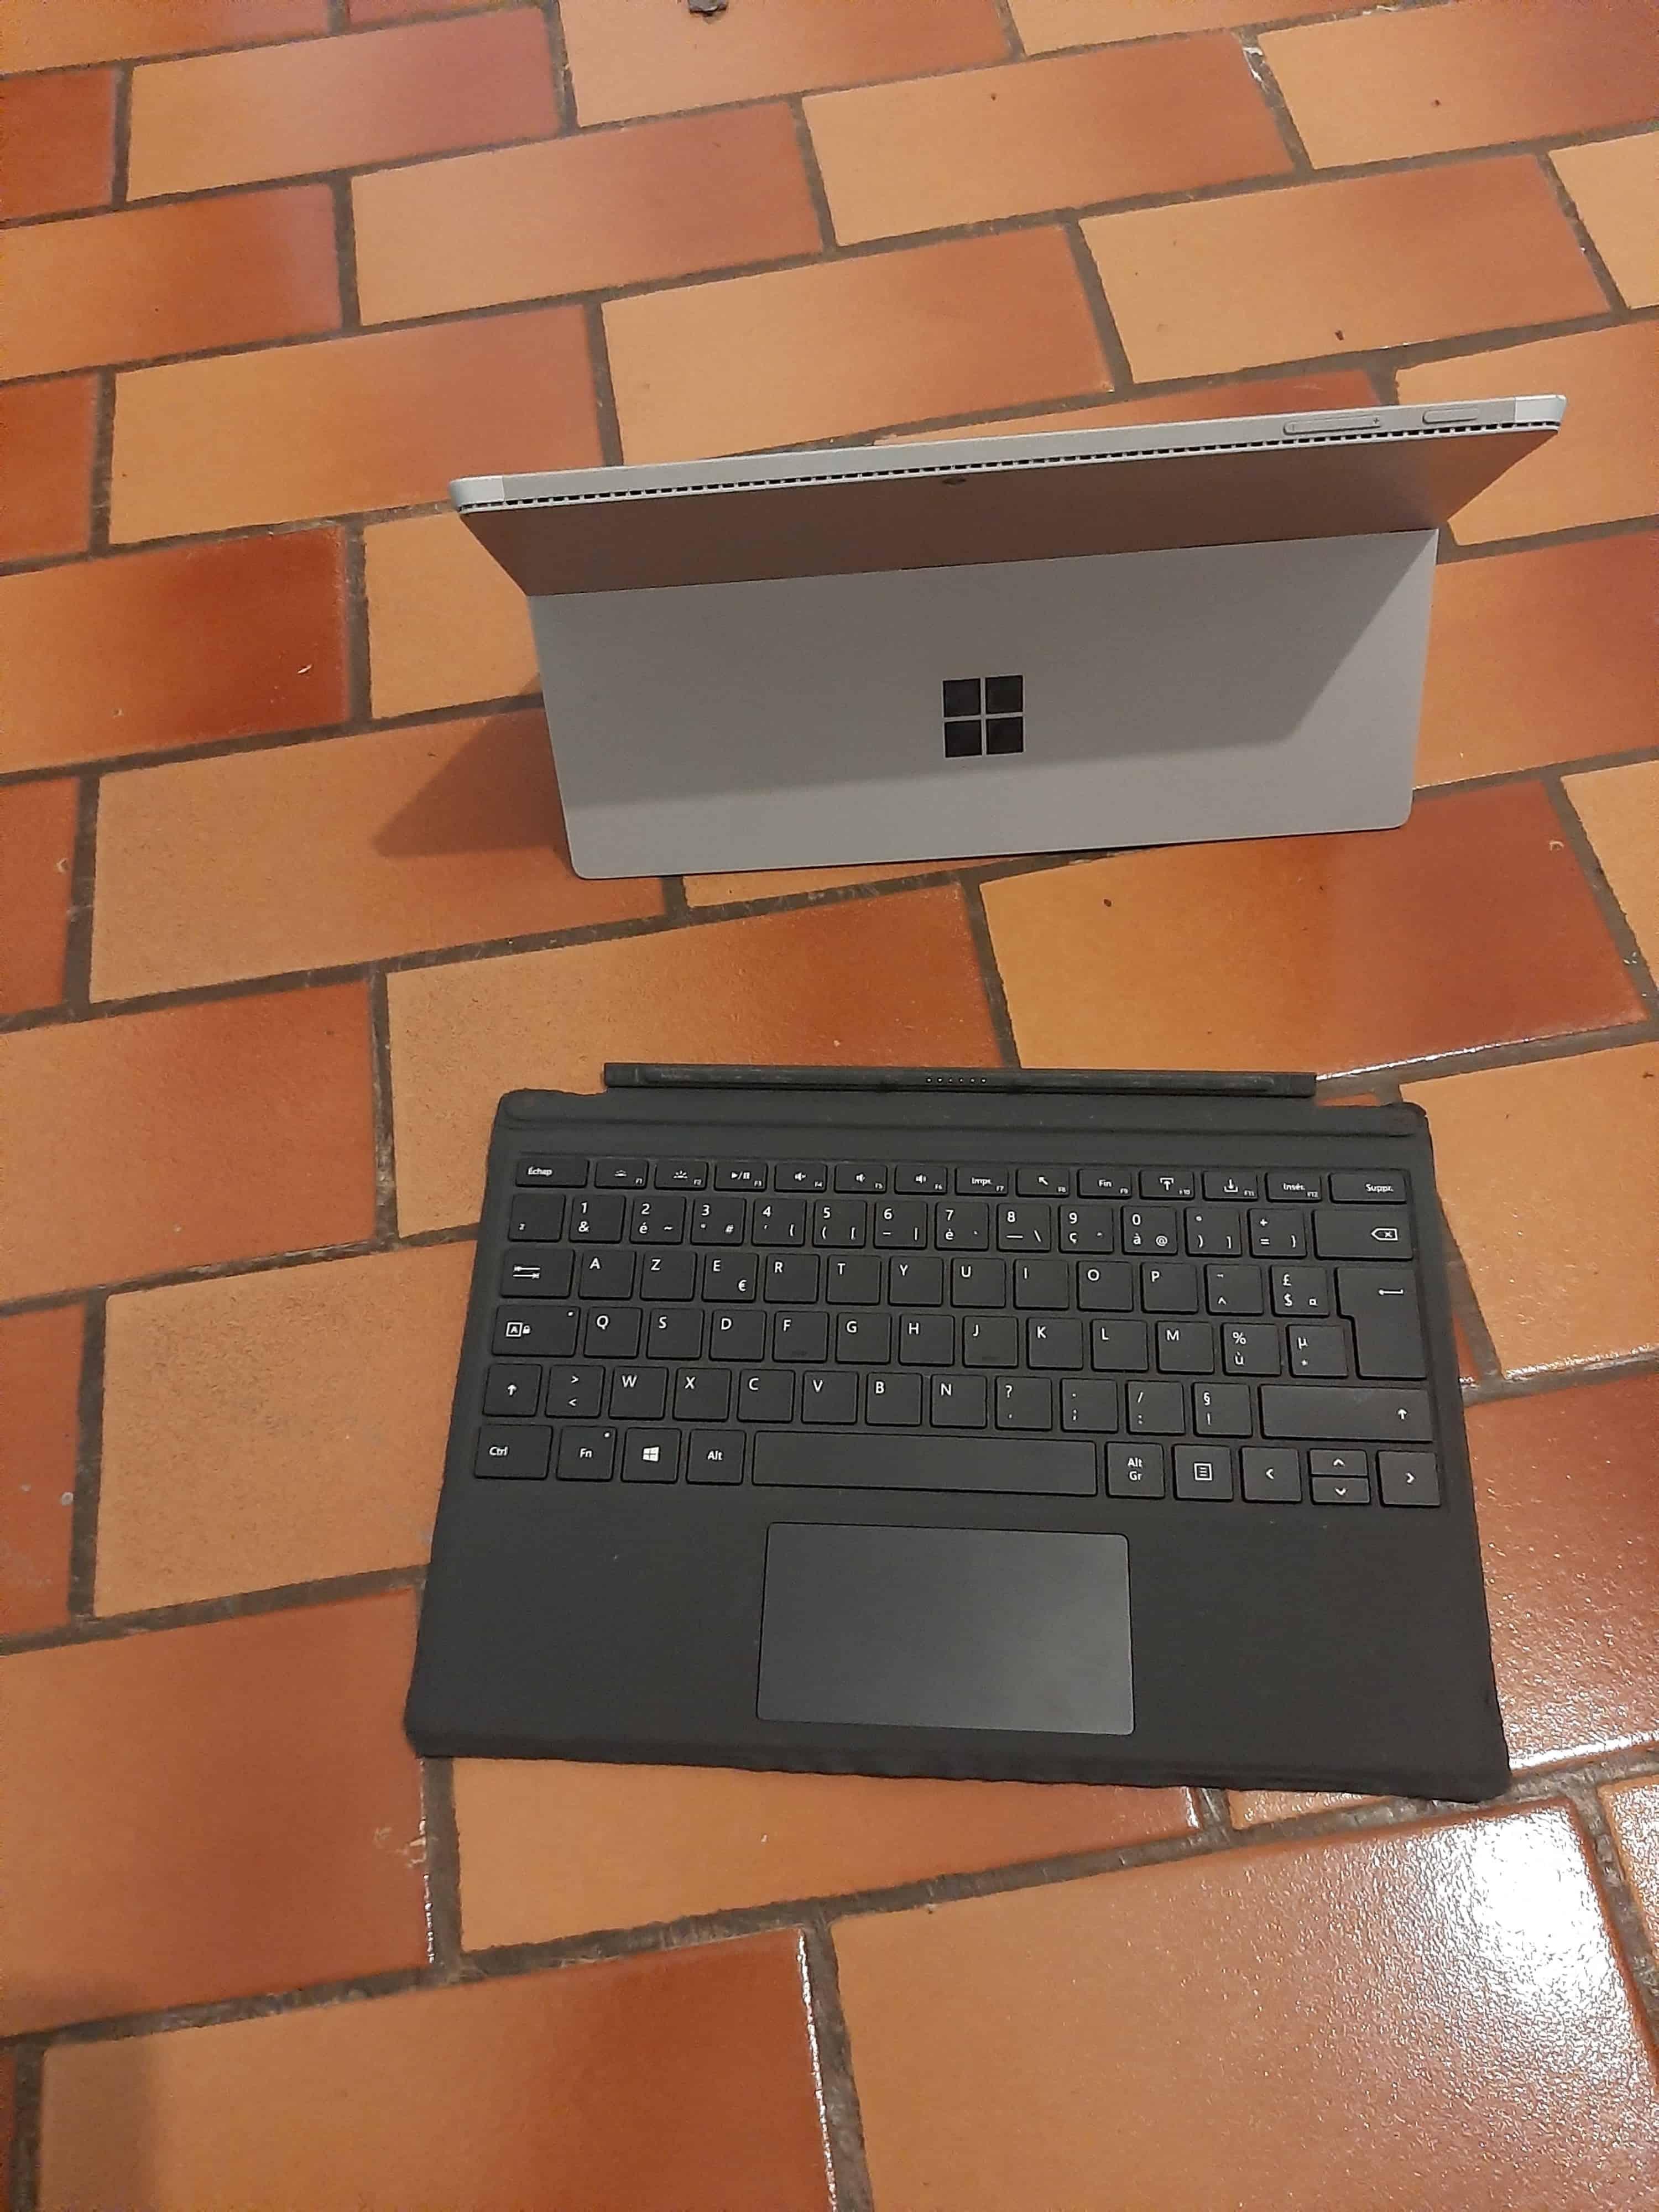 Vends ordi tablette surface pro 4 de Microsoft